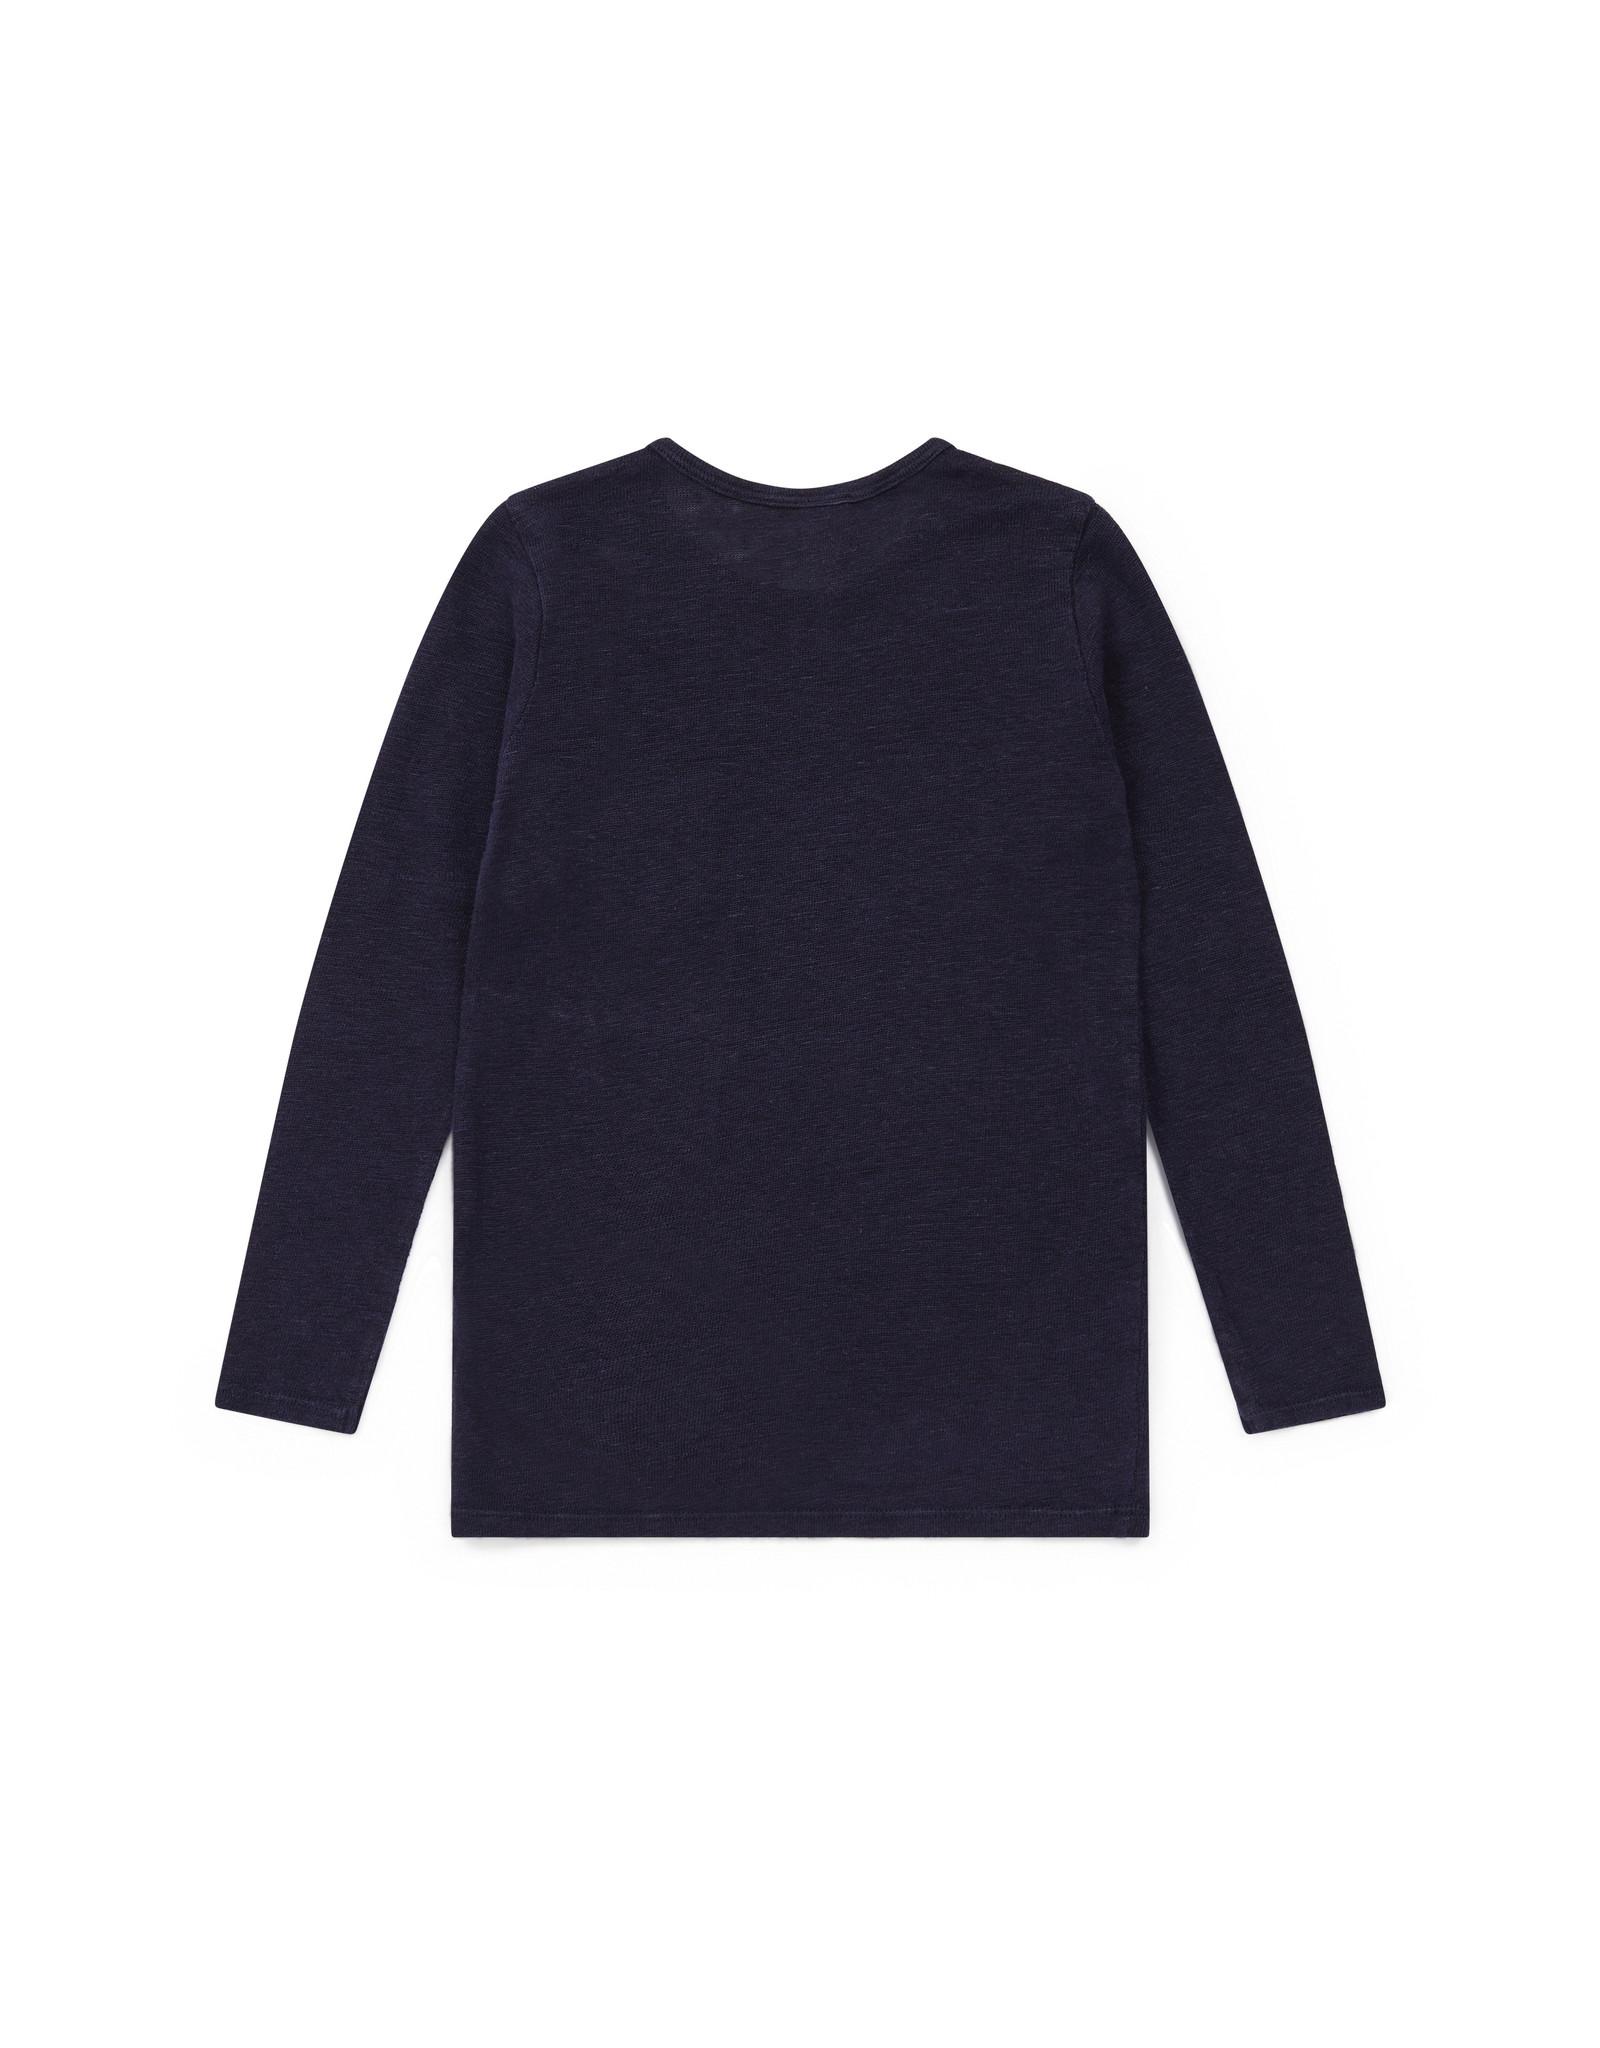 Bonton Sweater